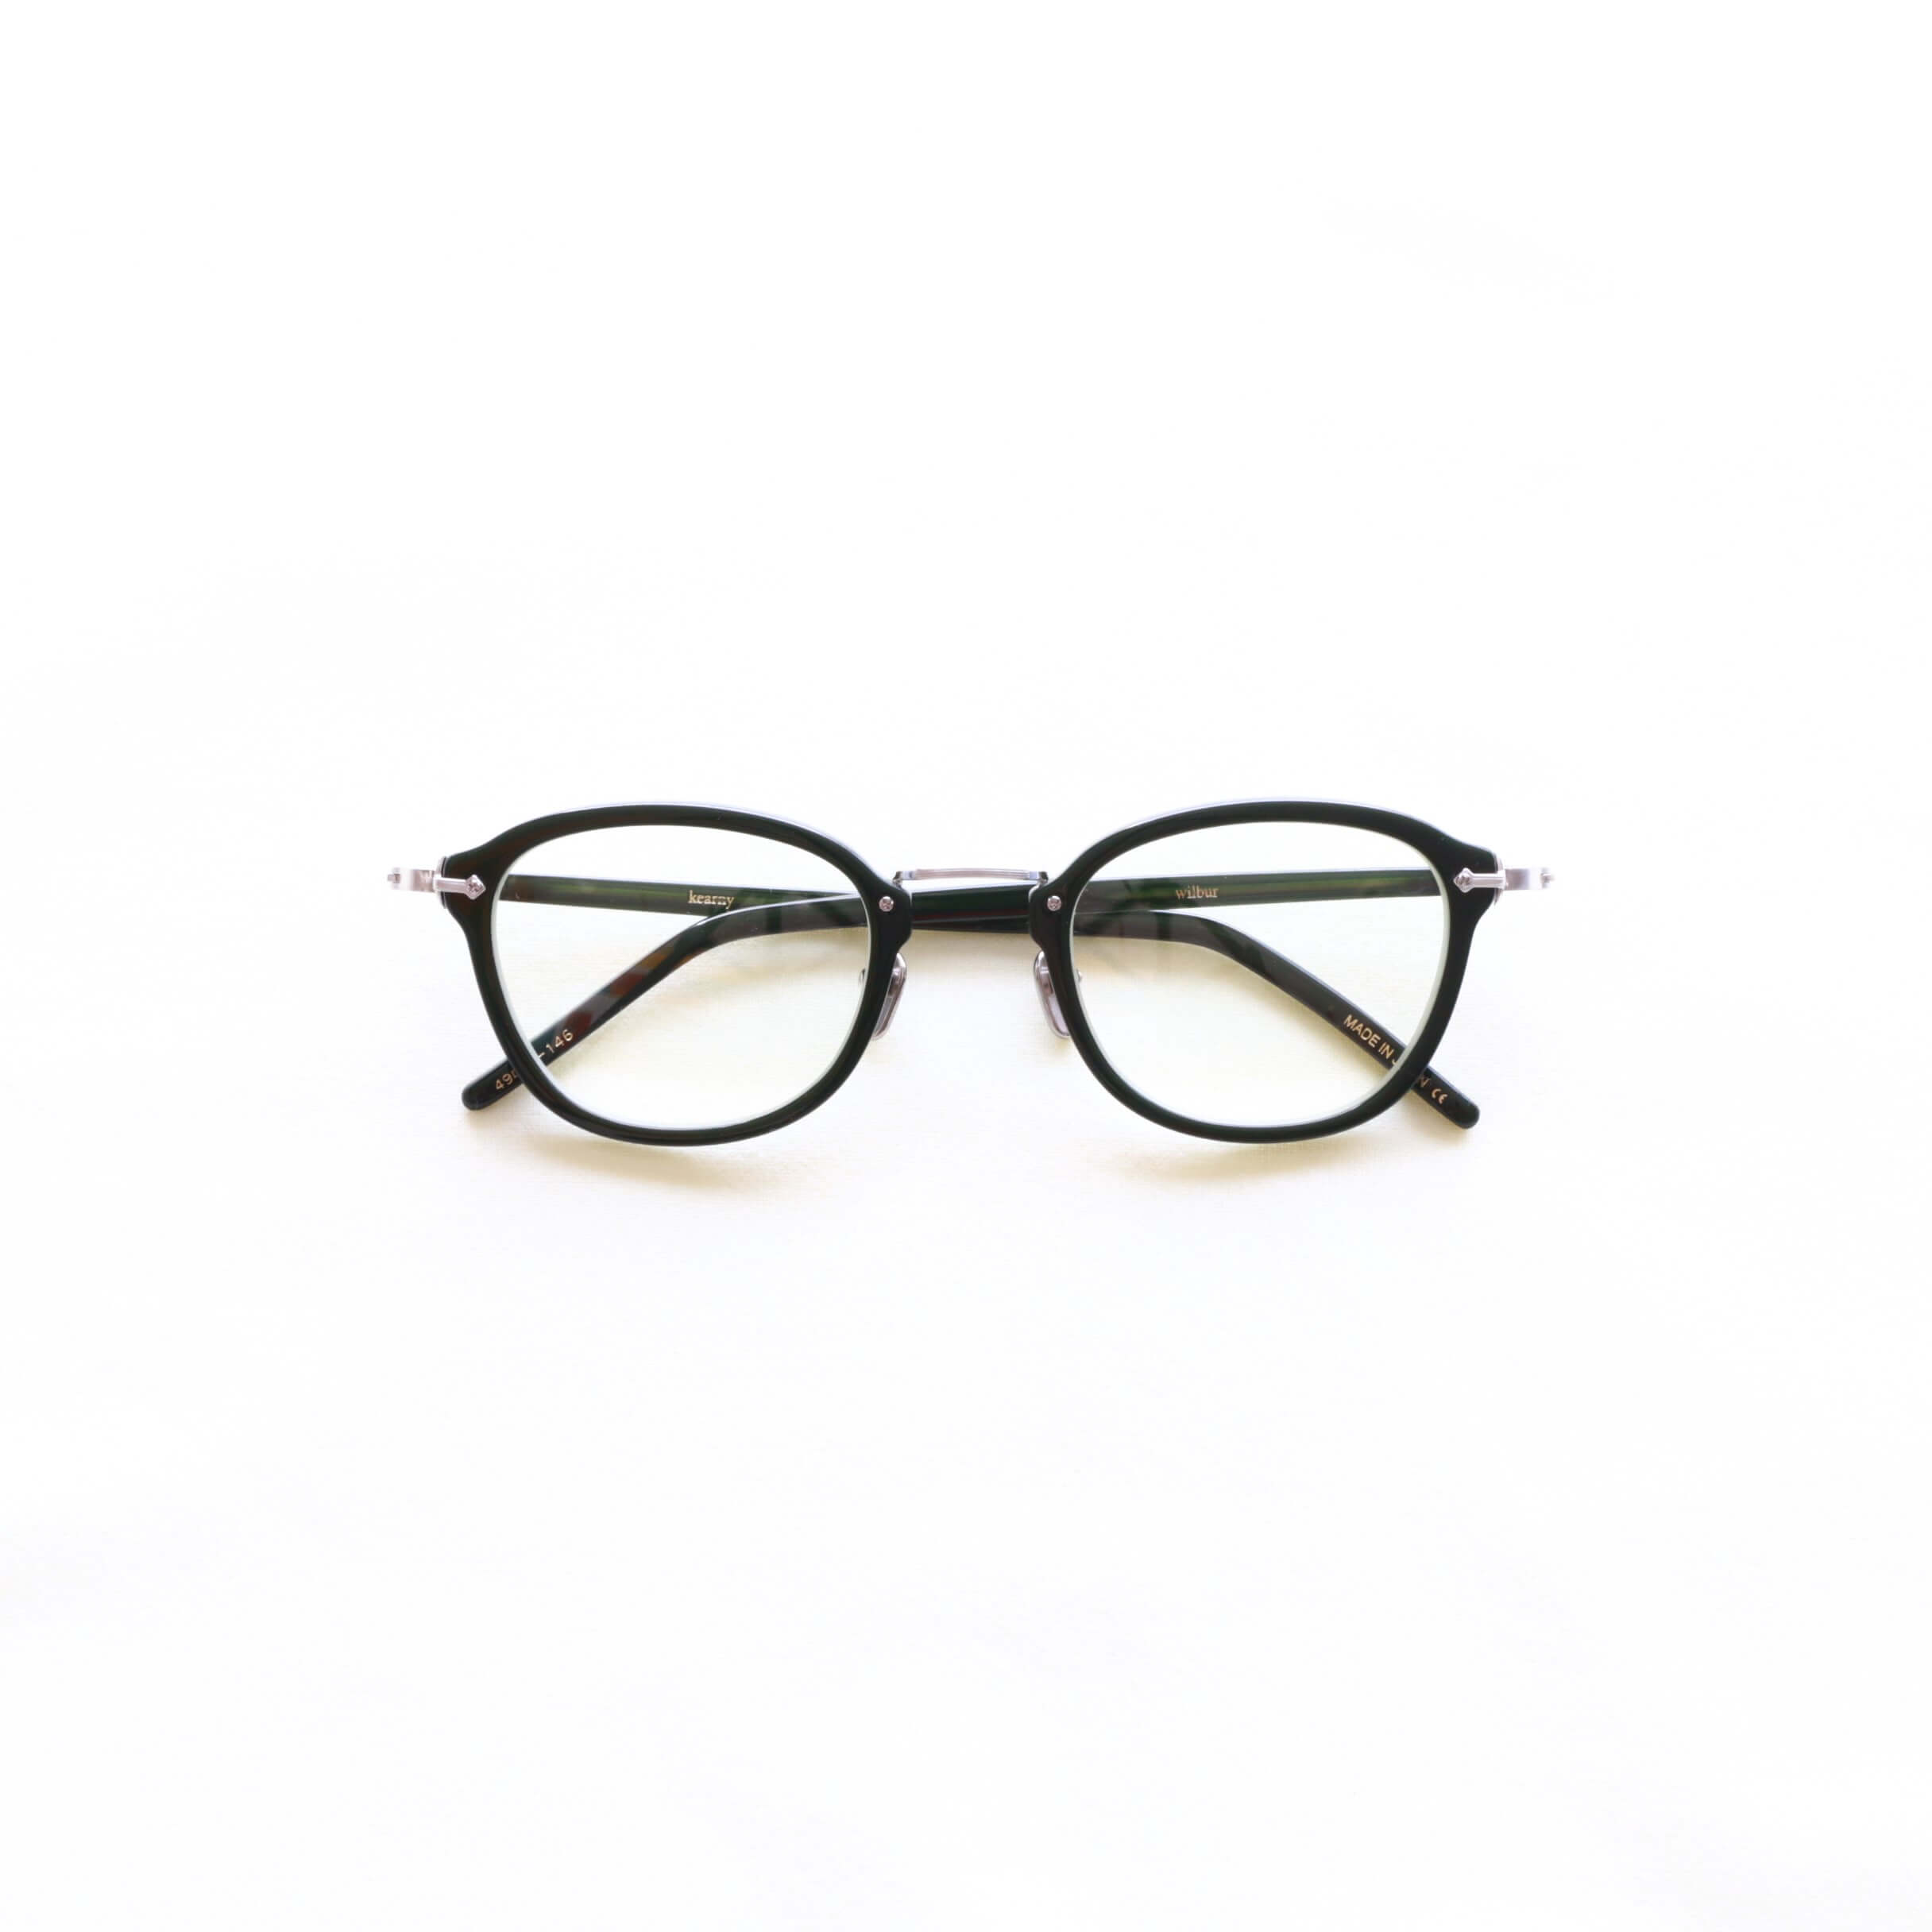 kearny カーニー wilbur ウィルバー セルロイド眼鏡